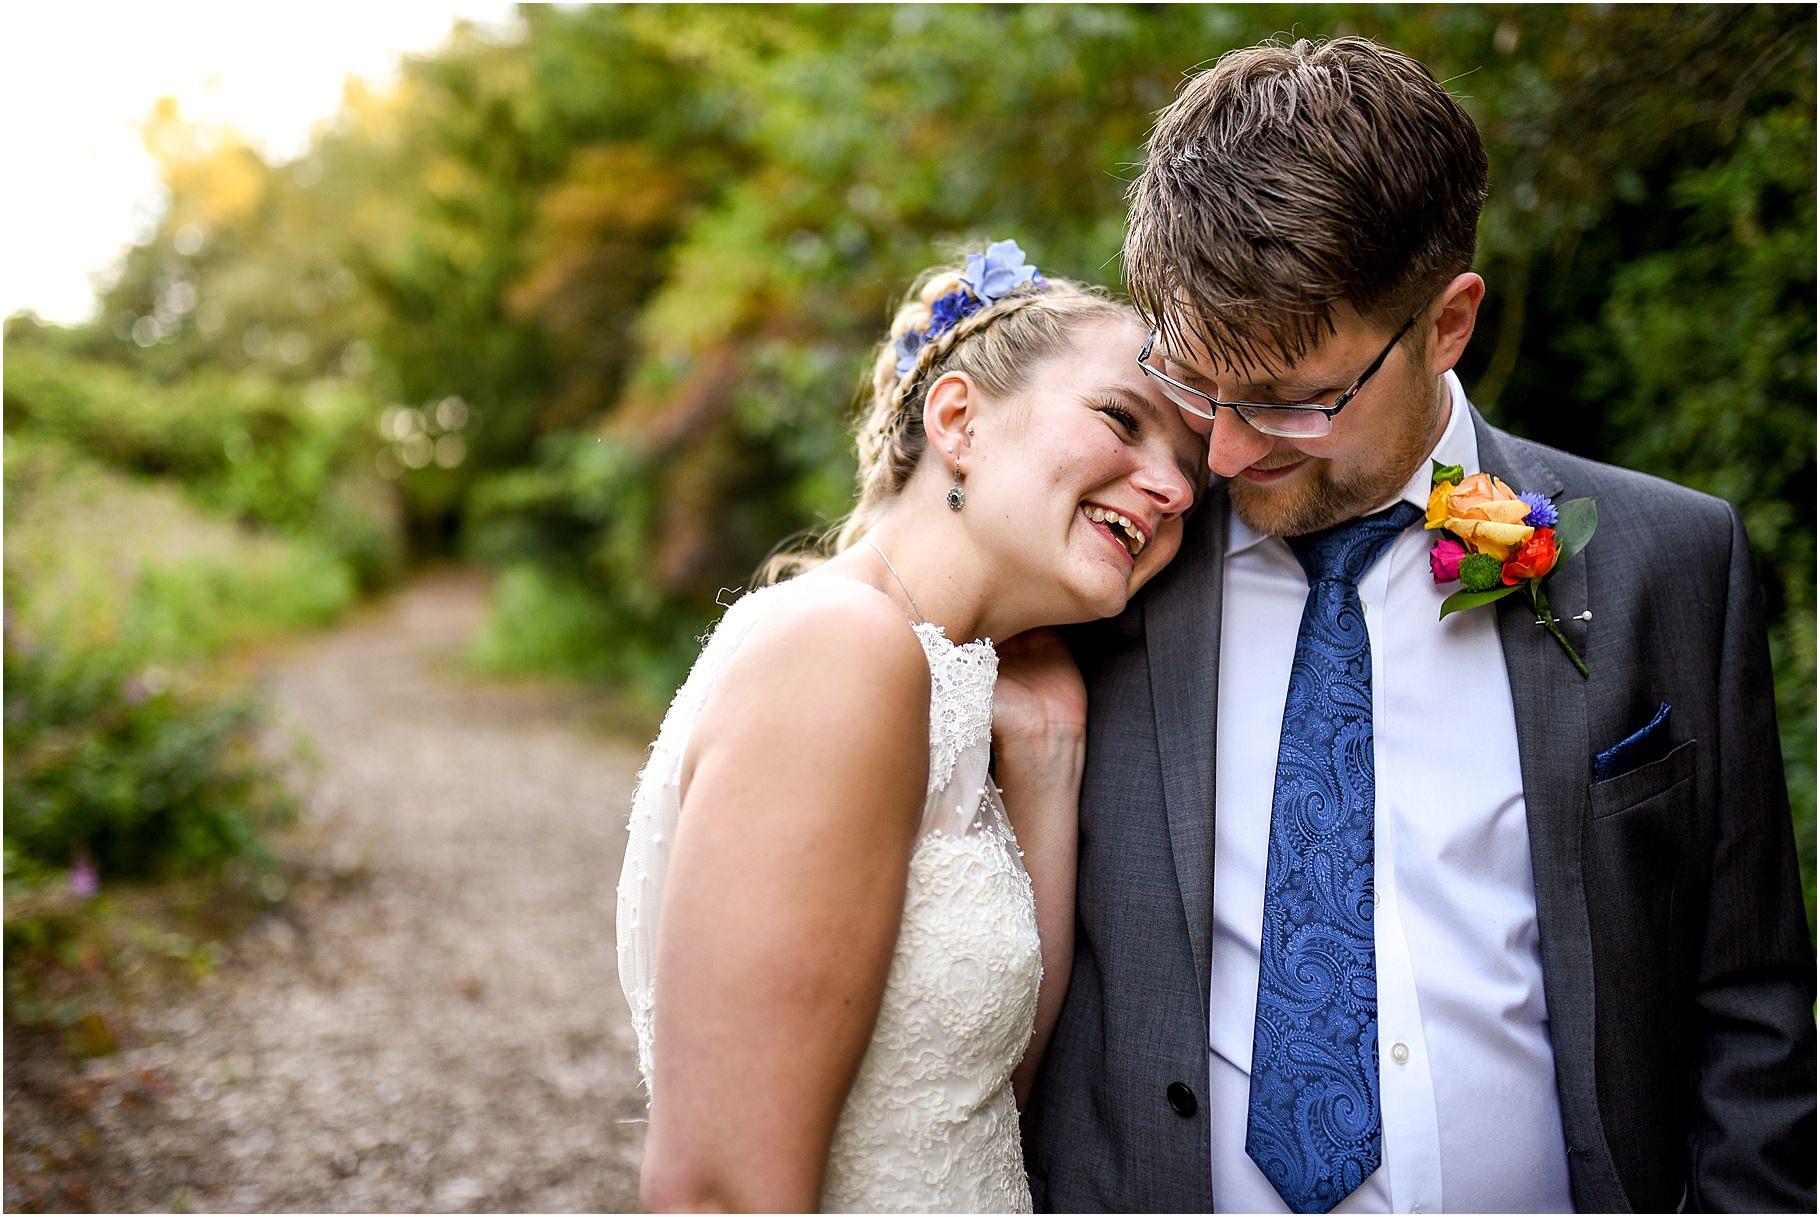 dan-wootton-photography-2017-weddings-144.jpg